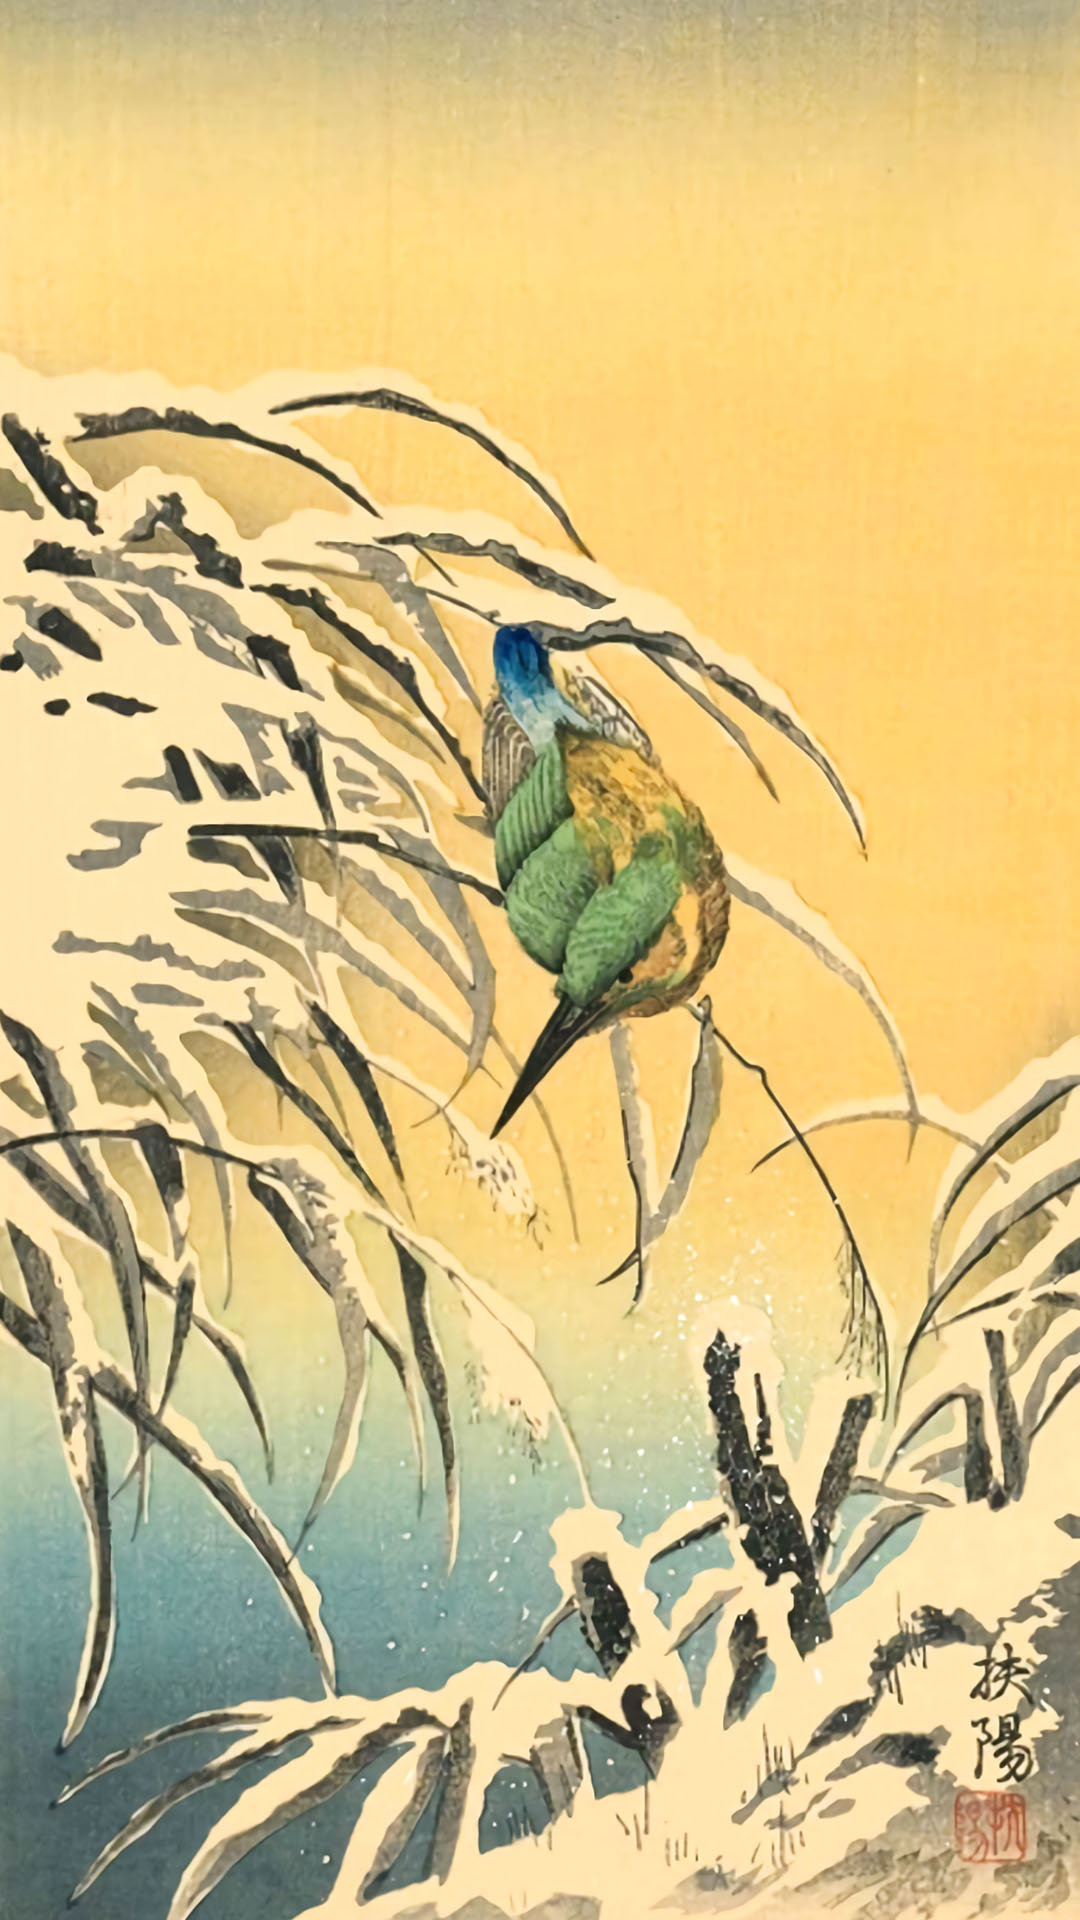 Narasaki Fuyou - Secchu kawasemi 1080x1920